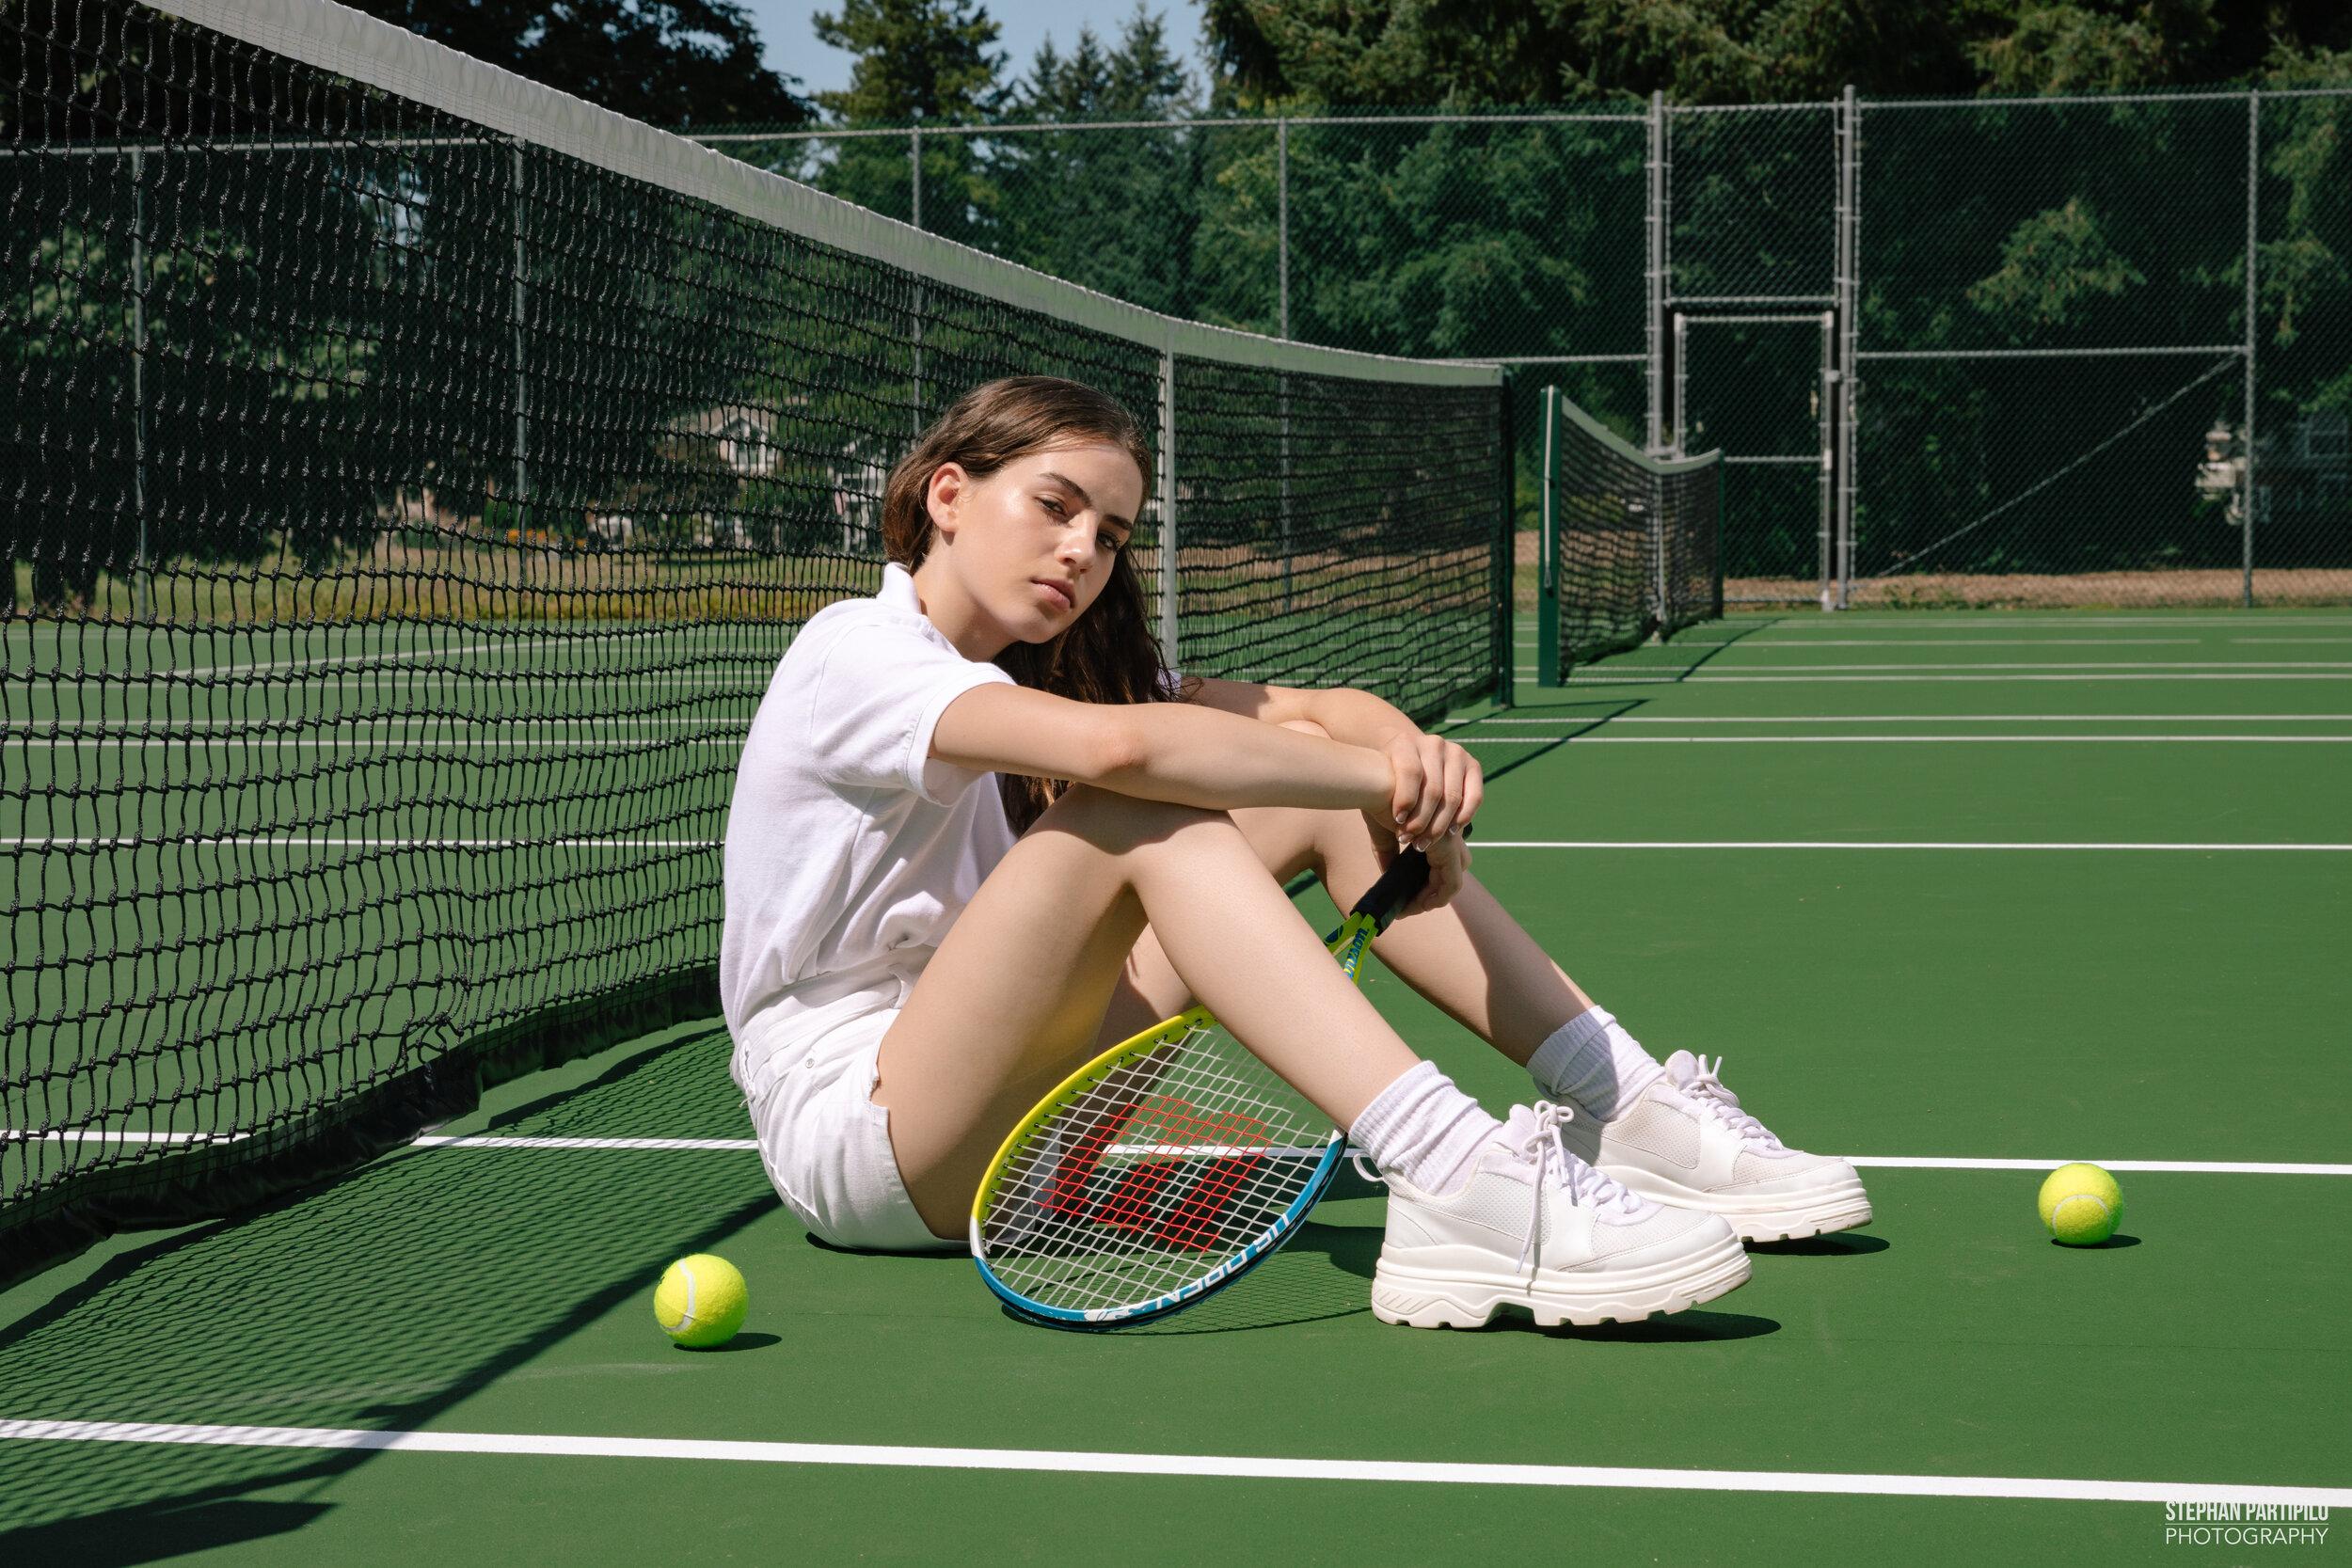 Karin Tennis Golf 2019 SP Favs IG 0G5A1248.jpg